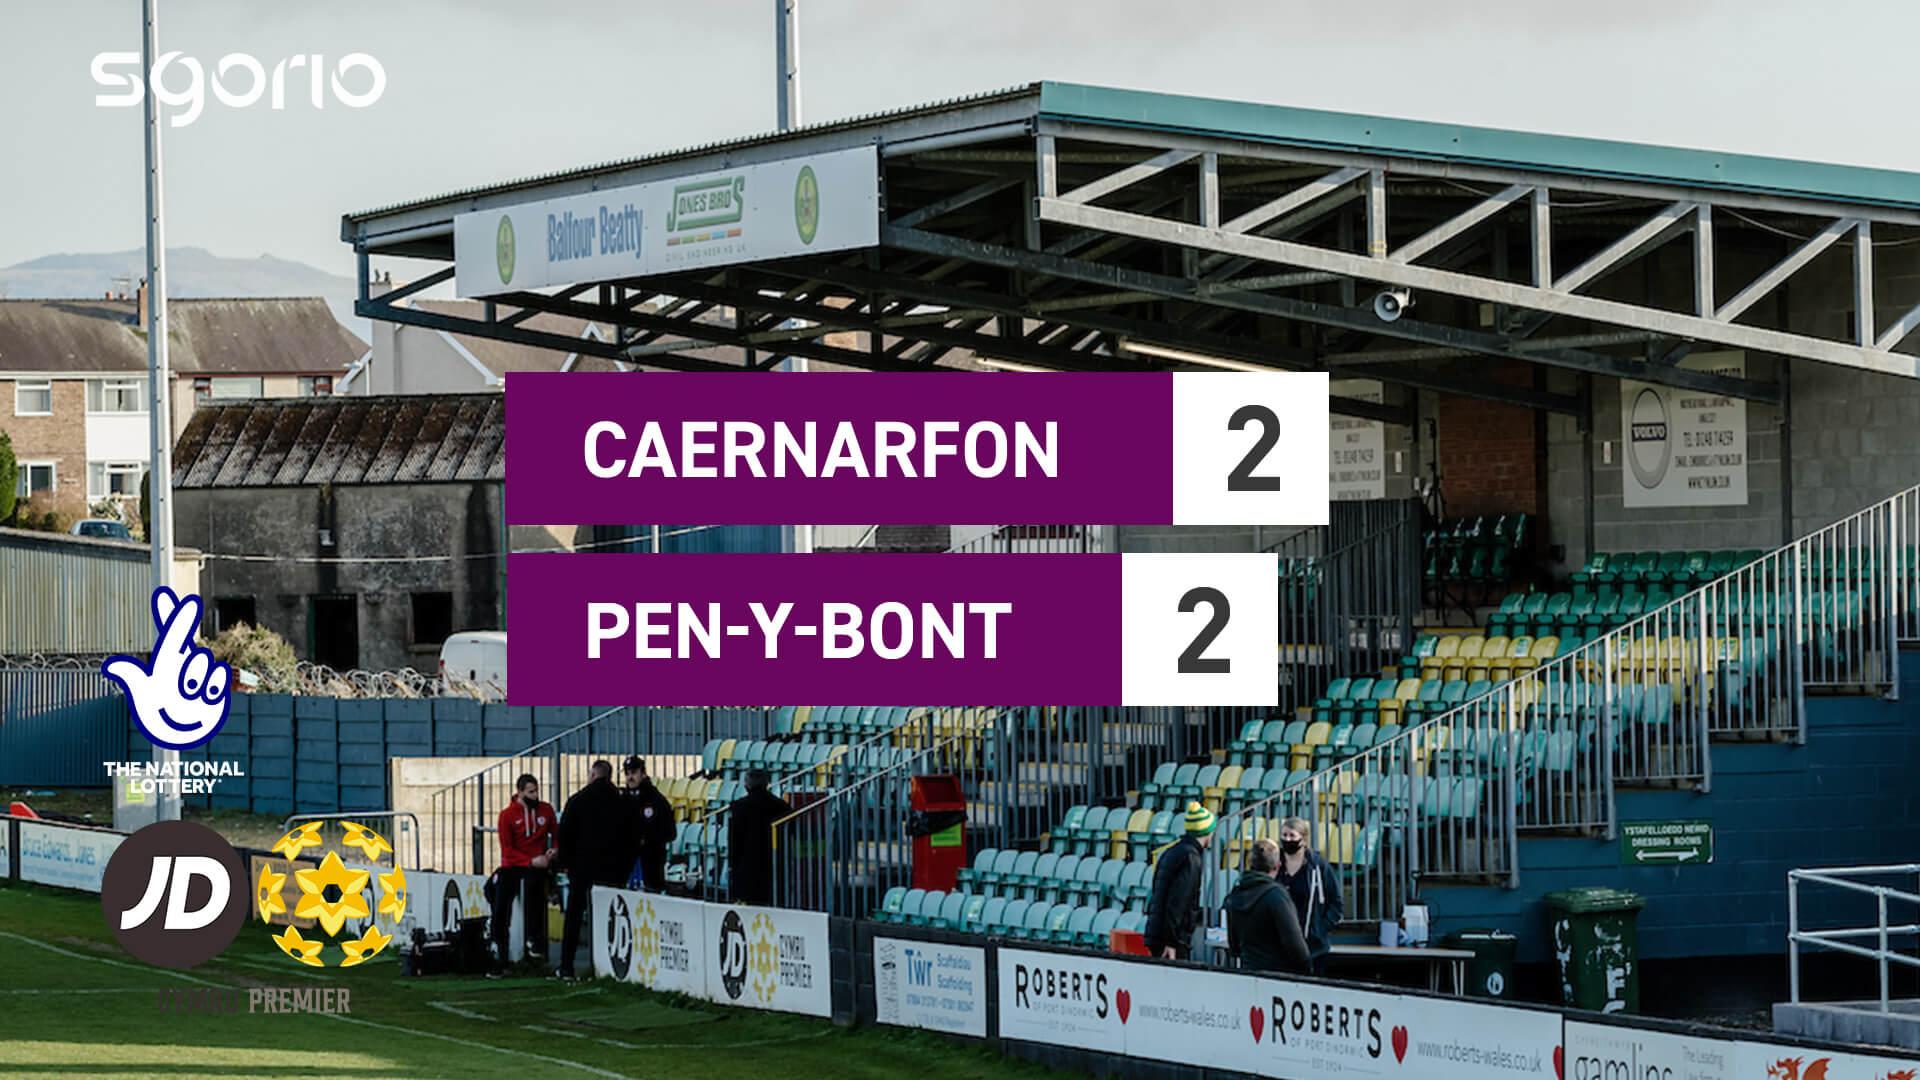 Caernarfon Town 2-2 Pen-y-bont